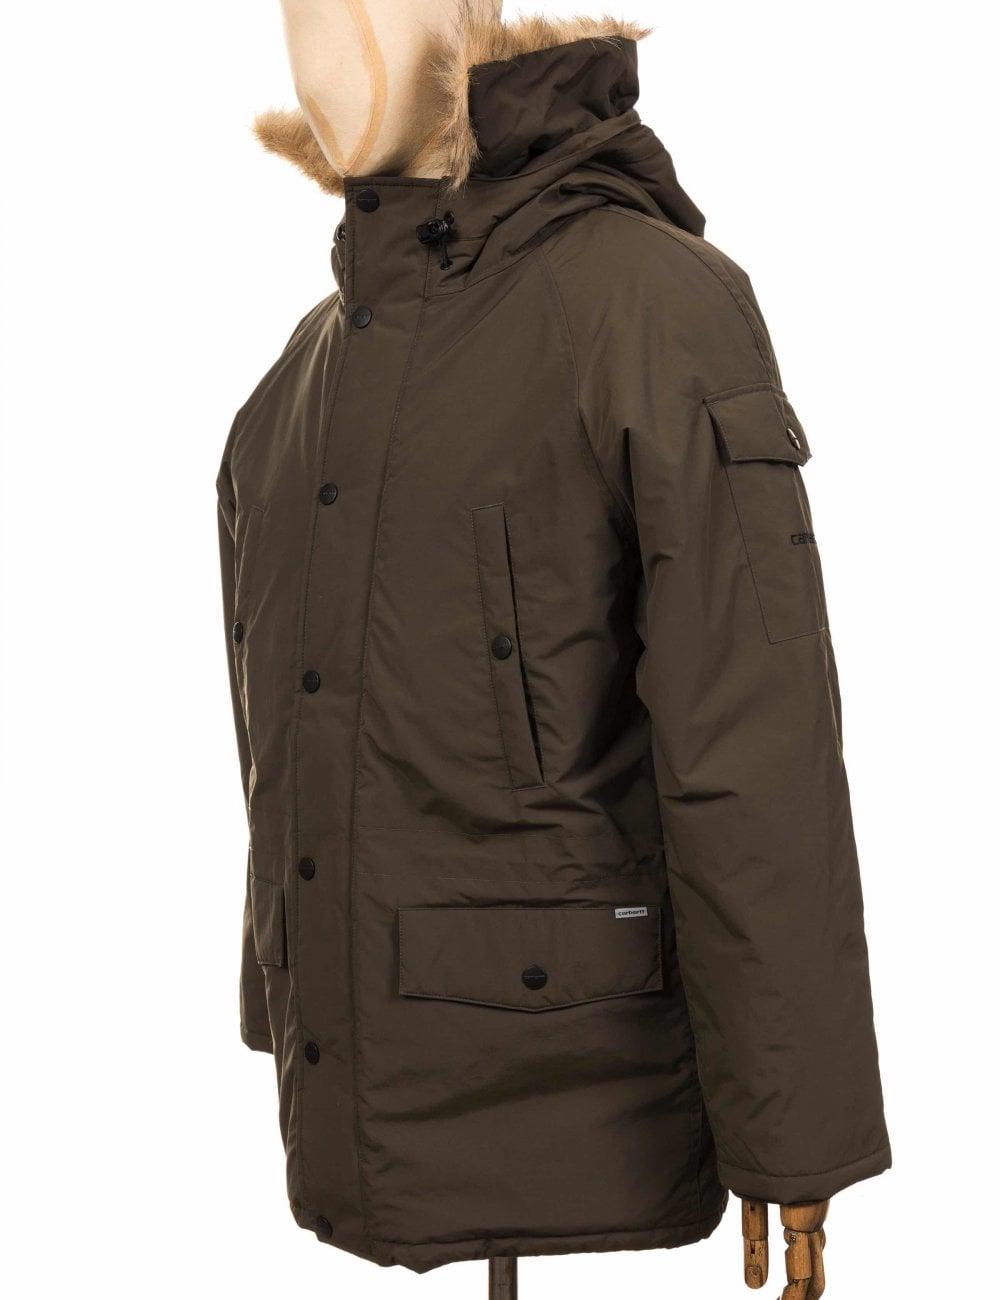 top design factory price san francisco Anchorage Parka Jacket - Cypress